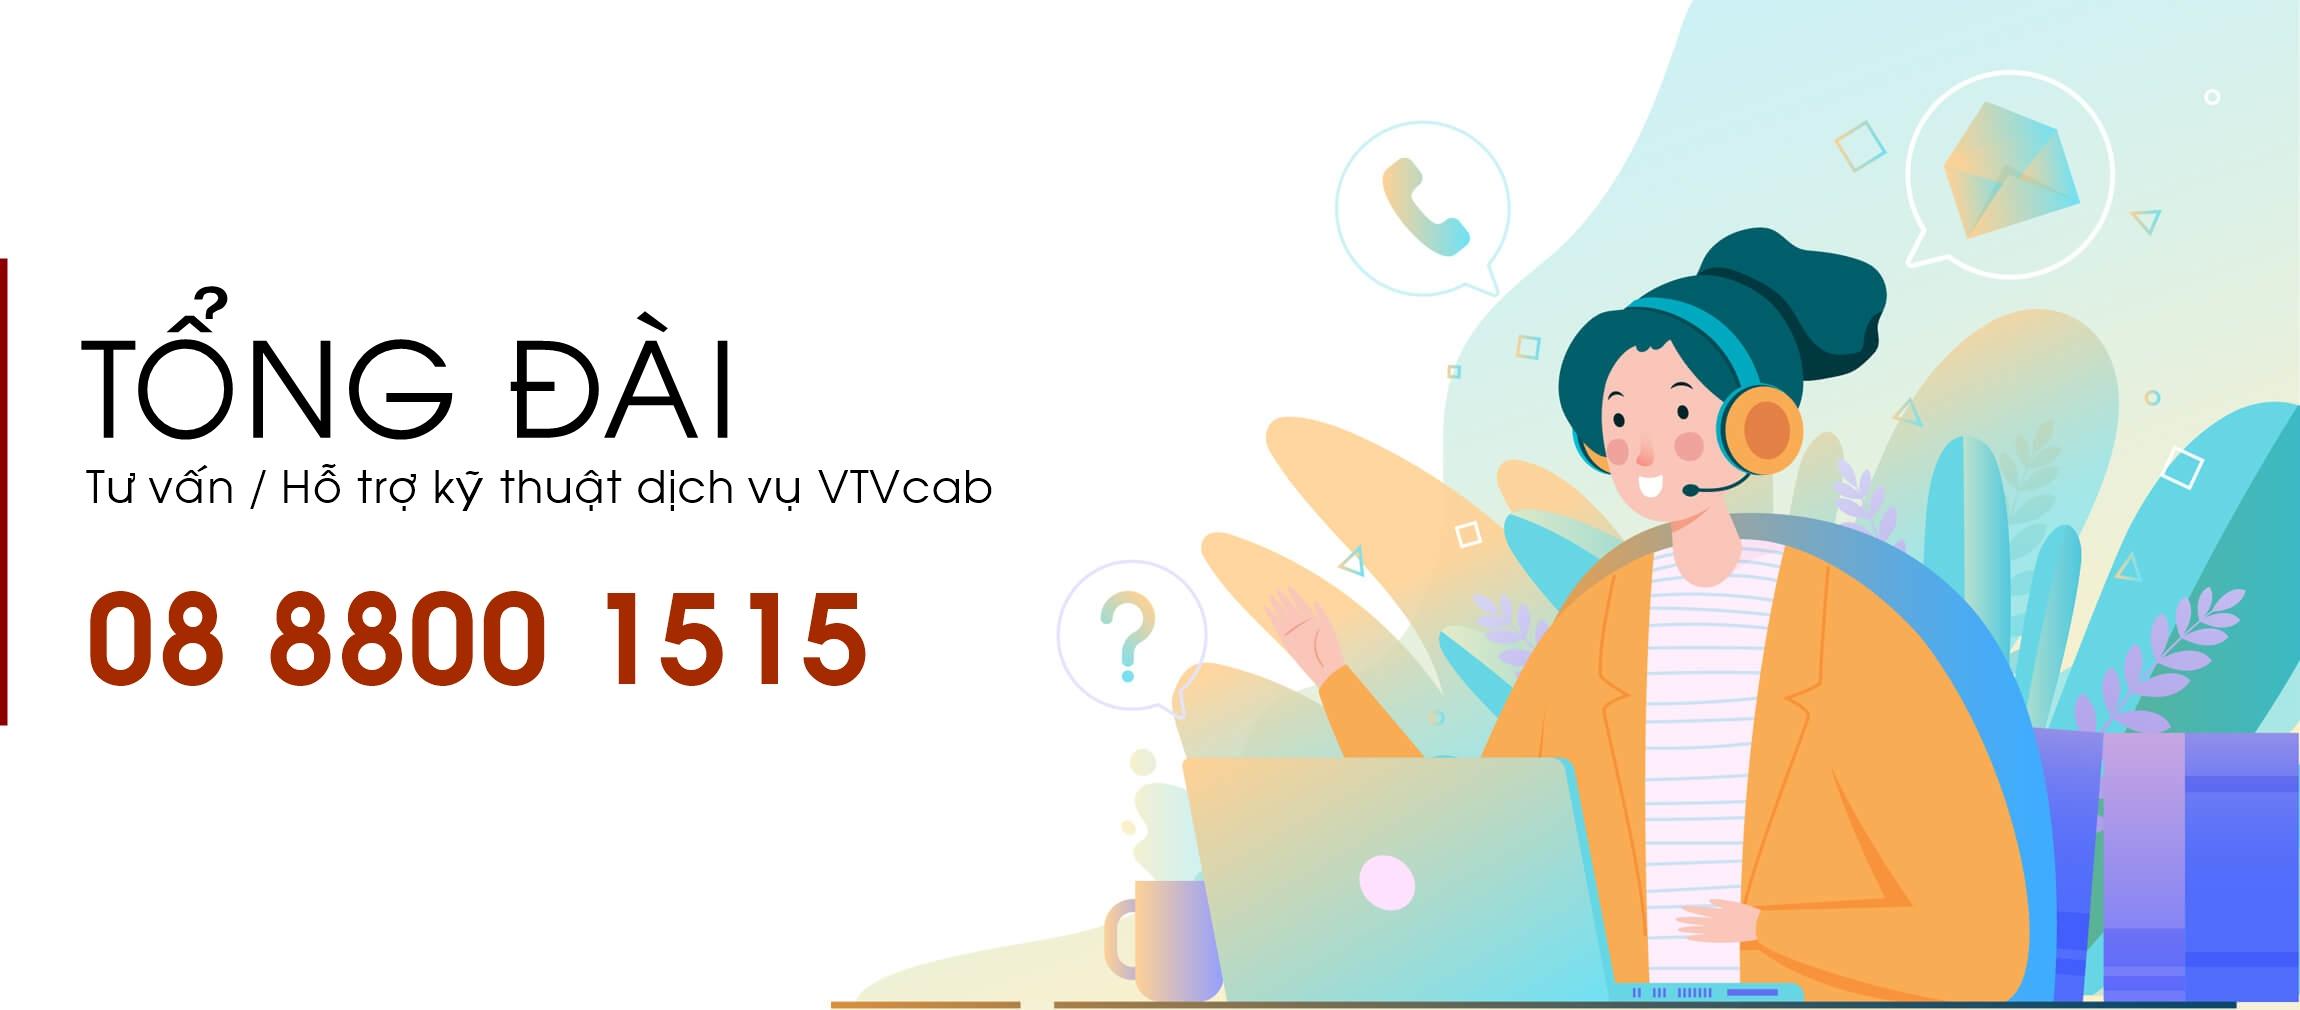 Tong dai VTVcab